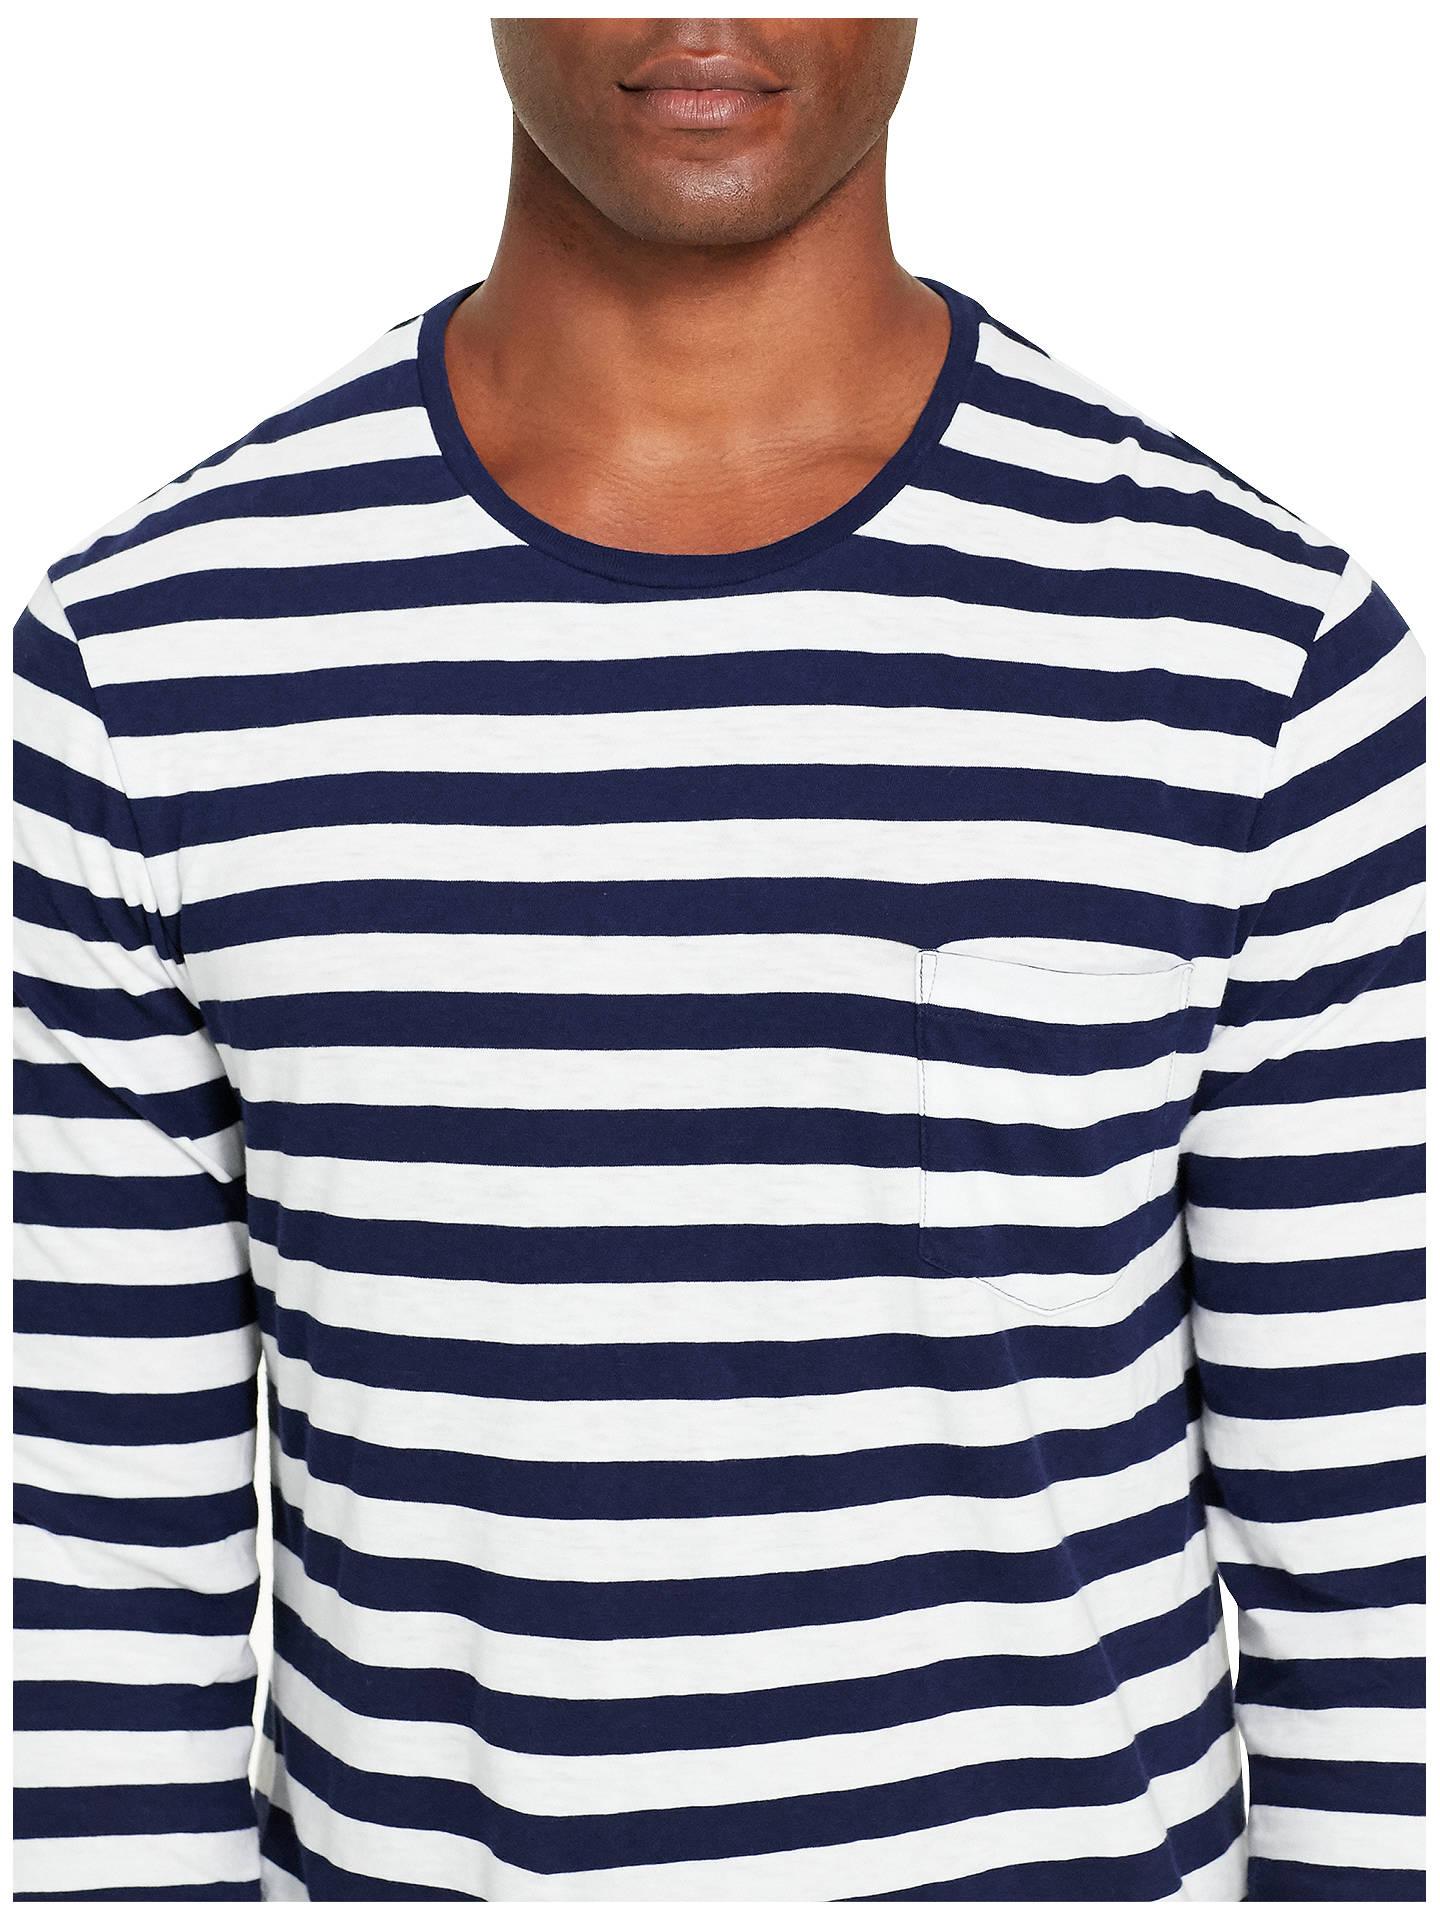 a8b97cdbcb8768 ... Buy Polo Ralph Lauren Striped Long Sleeve T-Shirt, Cruise Navy/White,  ...